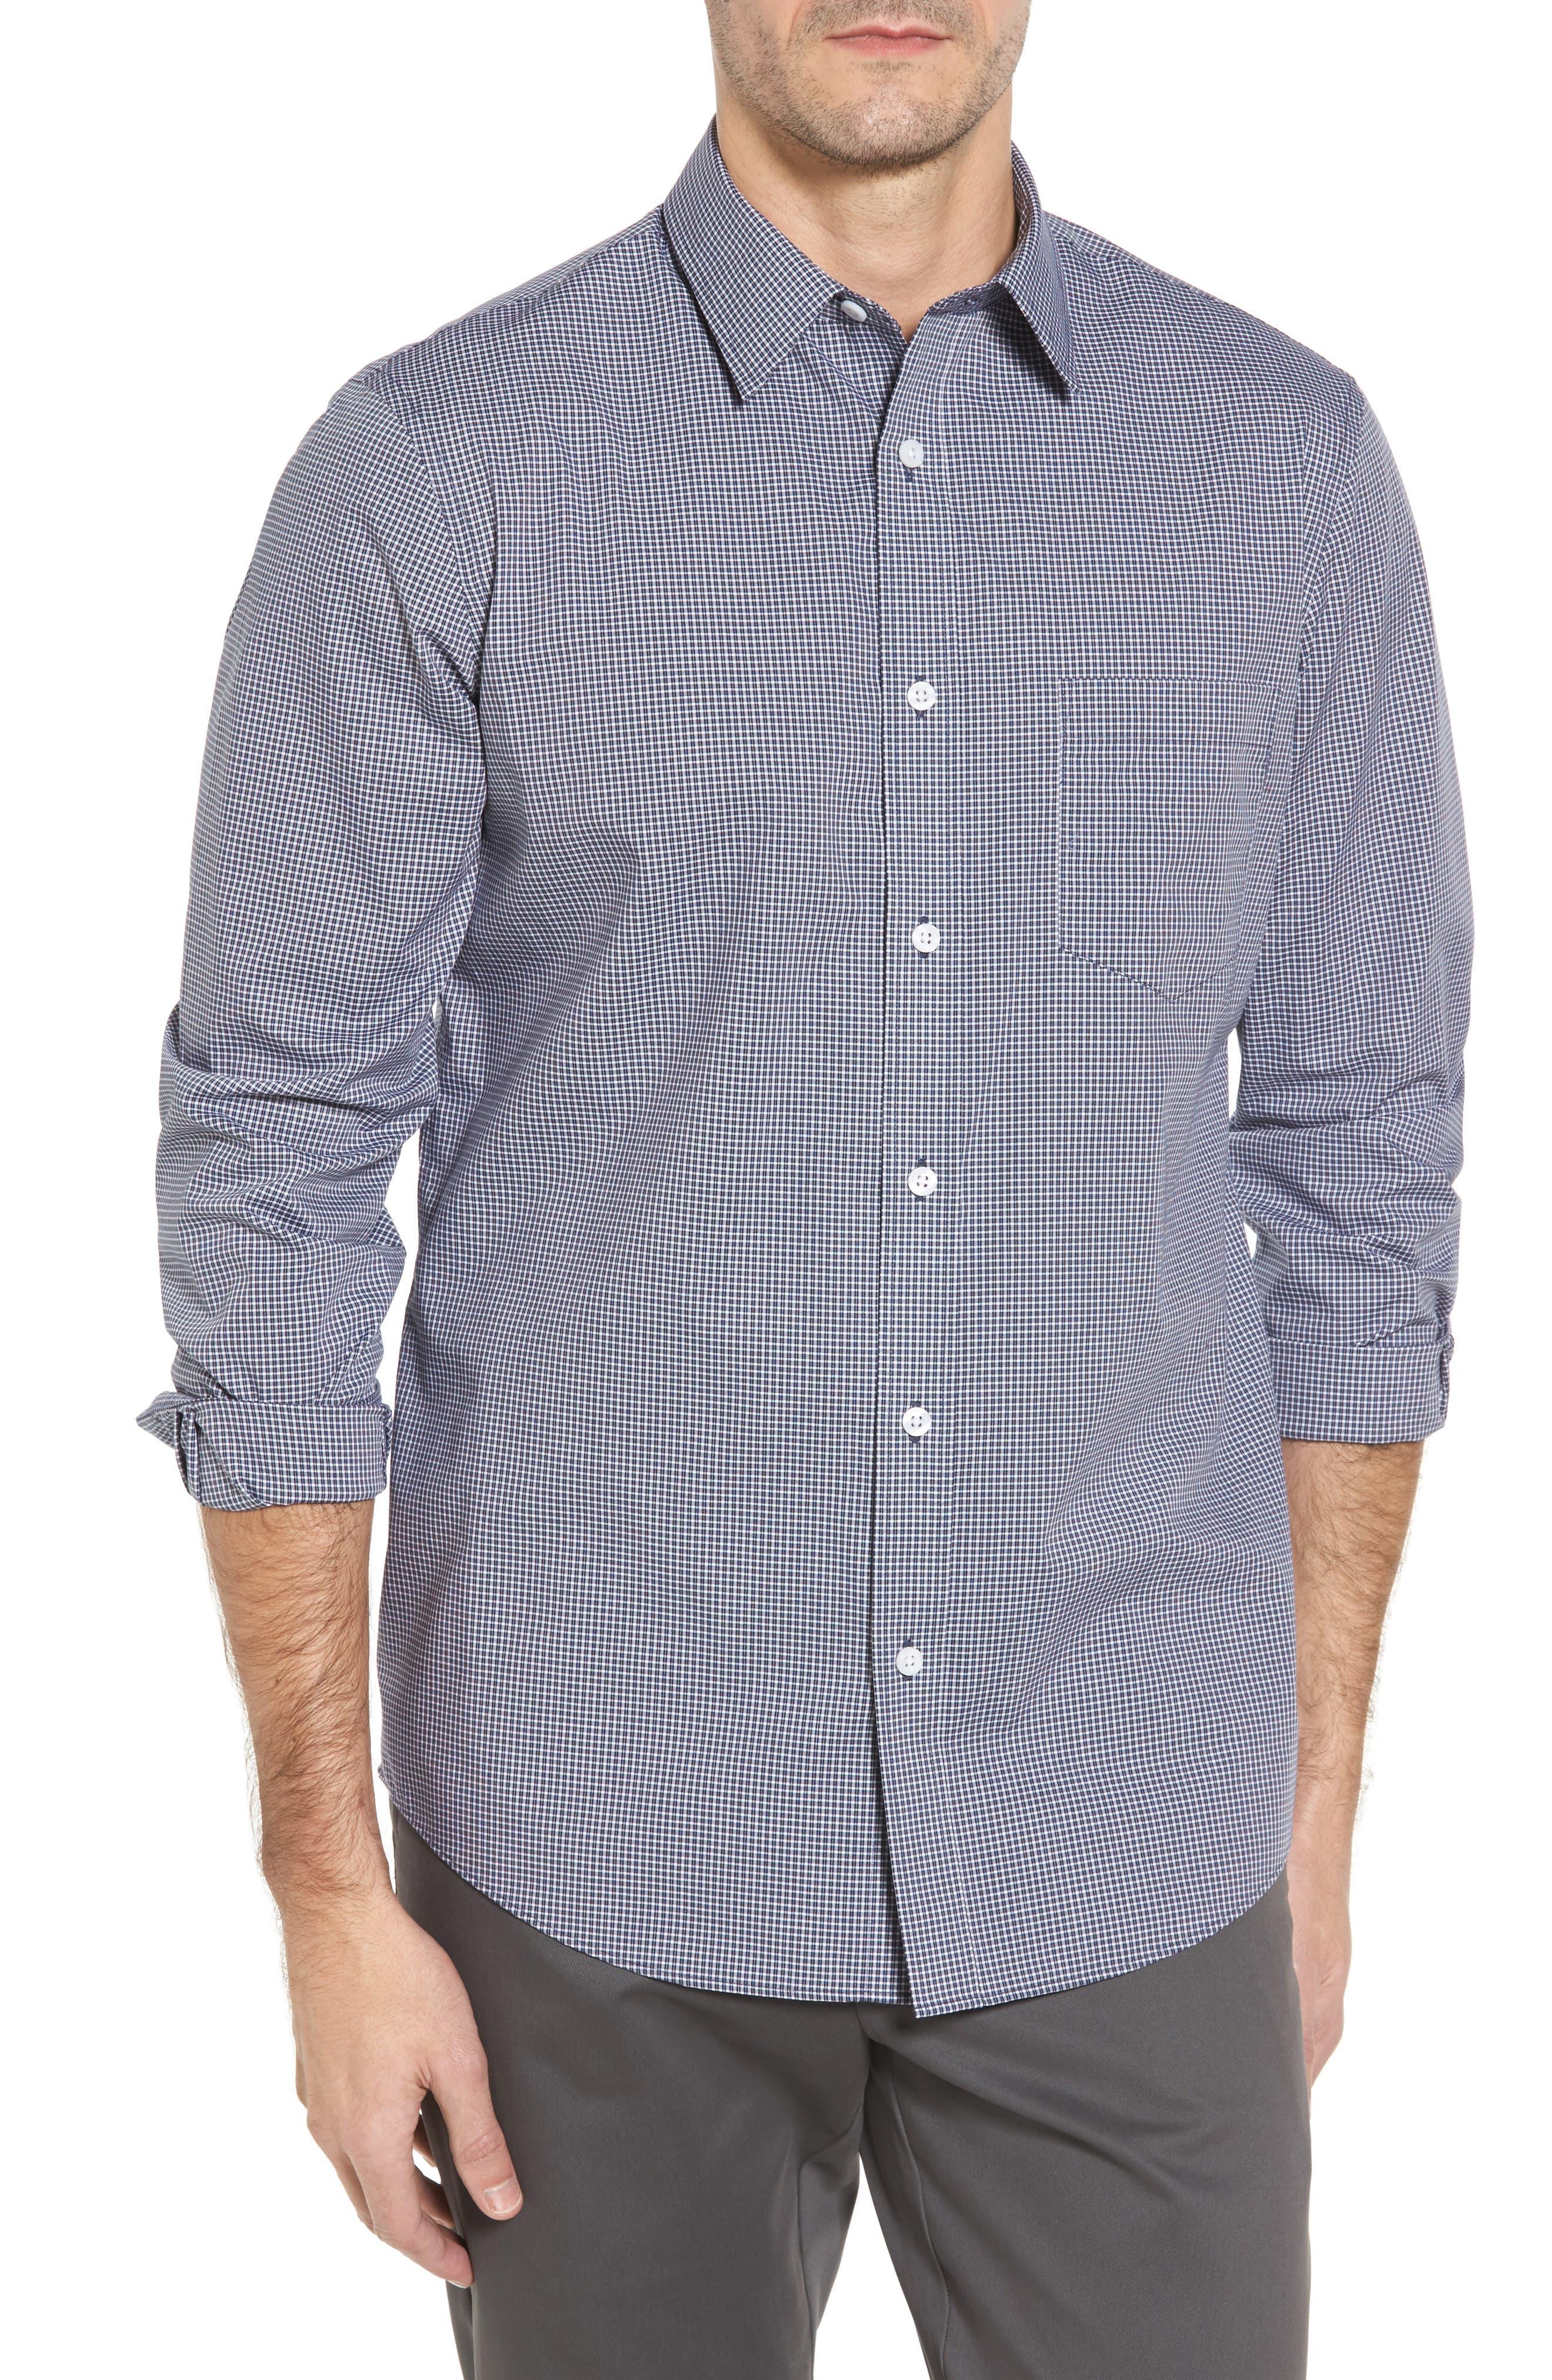 Alternate Image 1 Selected - Nordstrom Men's Shop Non-Iron Microcheck Sport Shirt